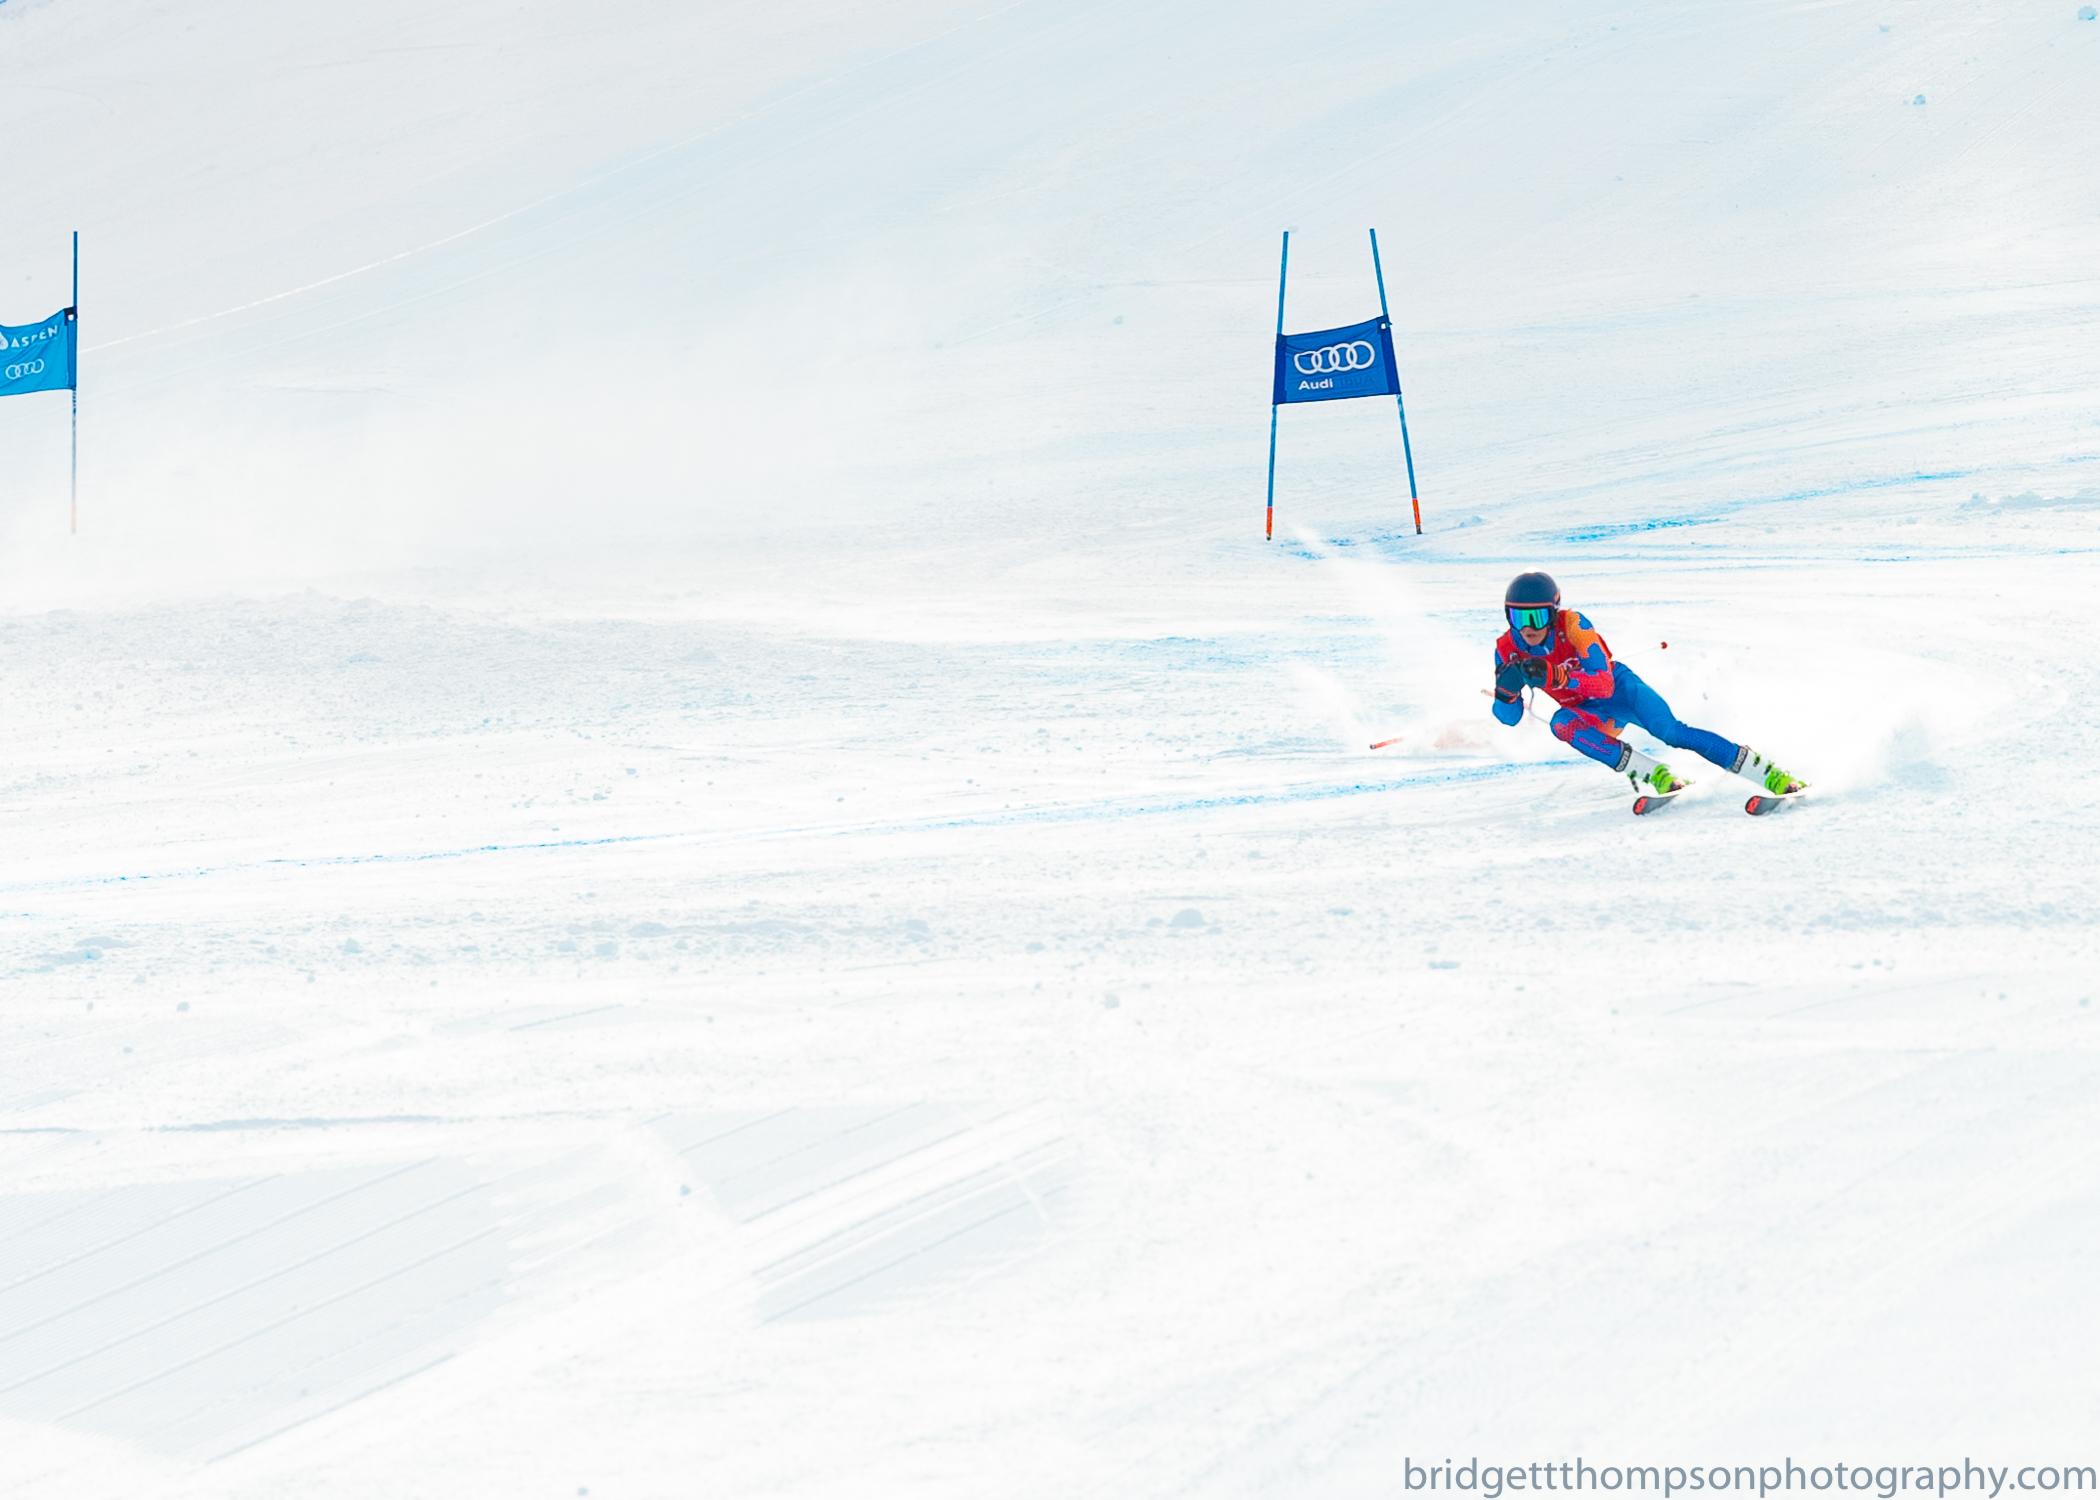 Colorado RC 2018 Race Season Aspen Feb JL Bridgett Thompson -22.jpg